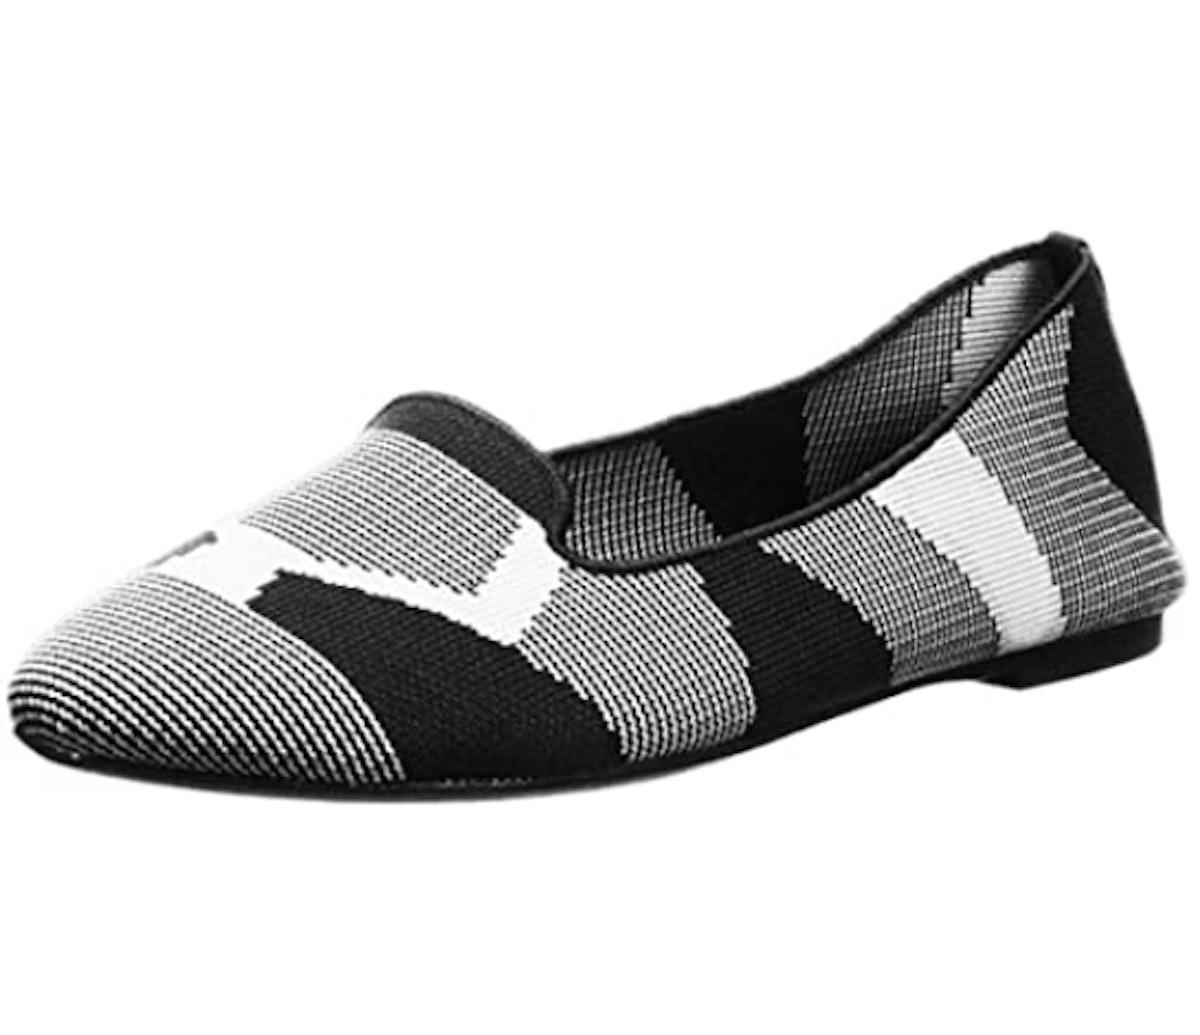 Skechers Knit Loafer